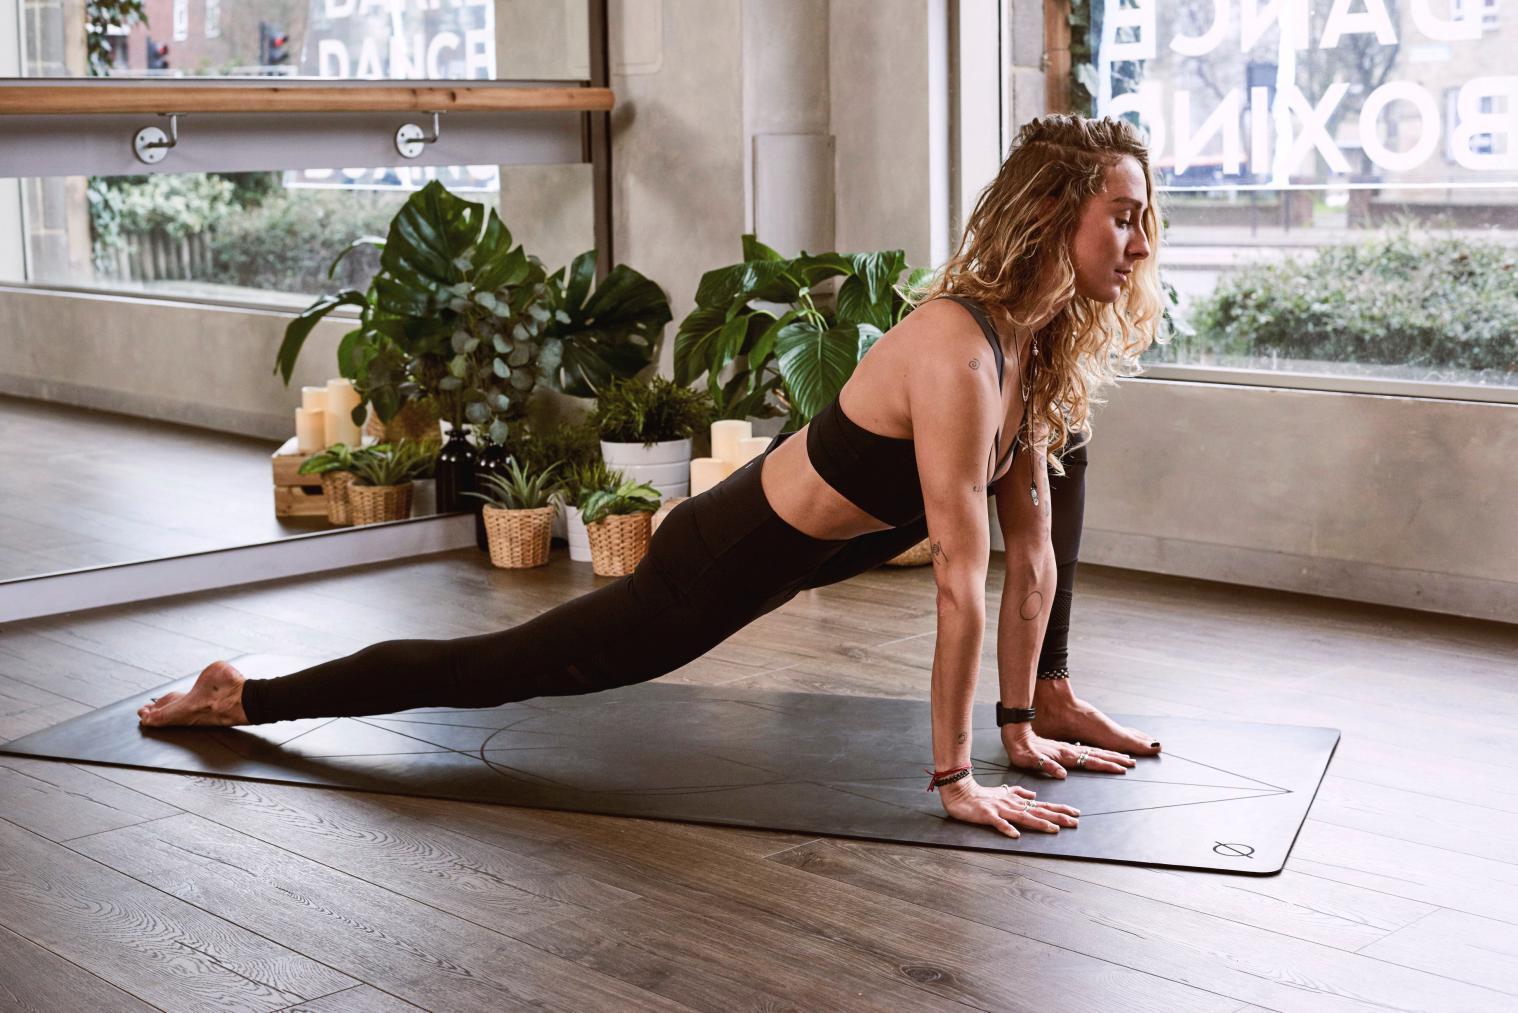 acro-yoga-active-balance-1882005